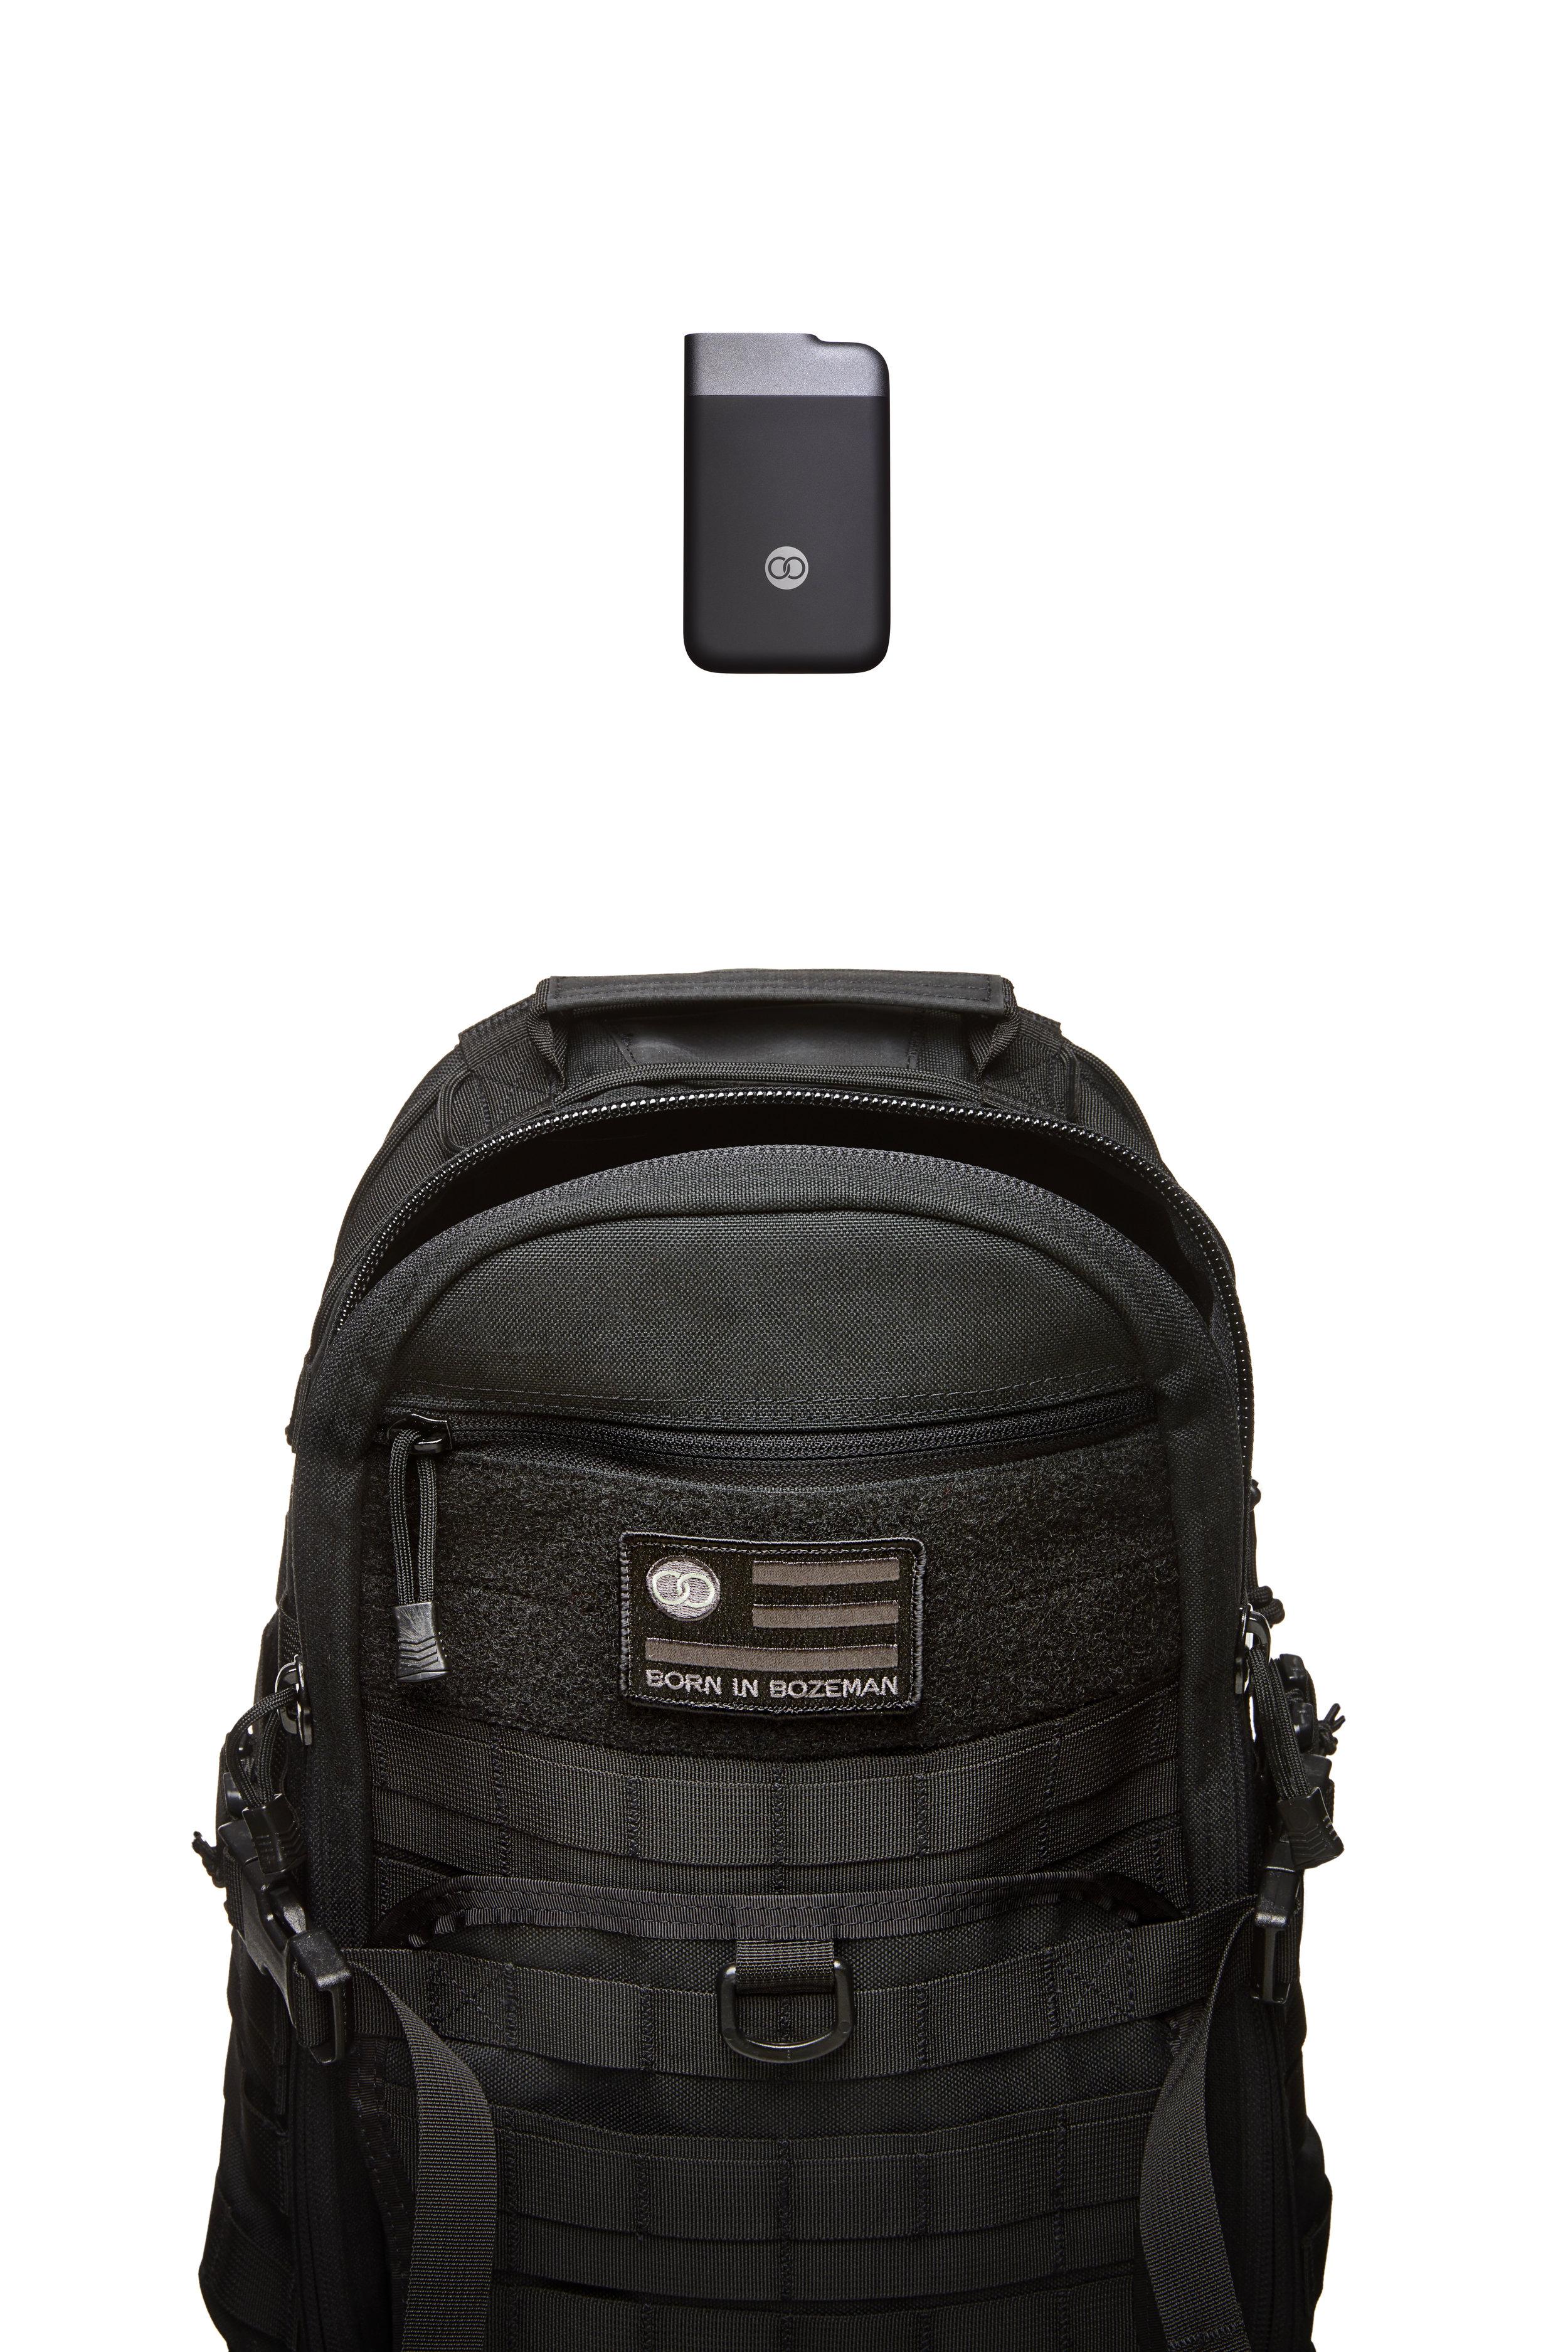 GD_Beartooth_Backpack.jpg